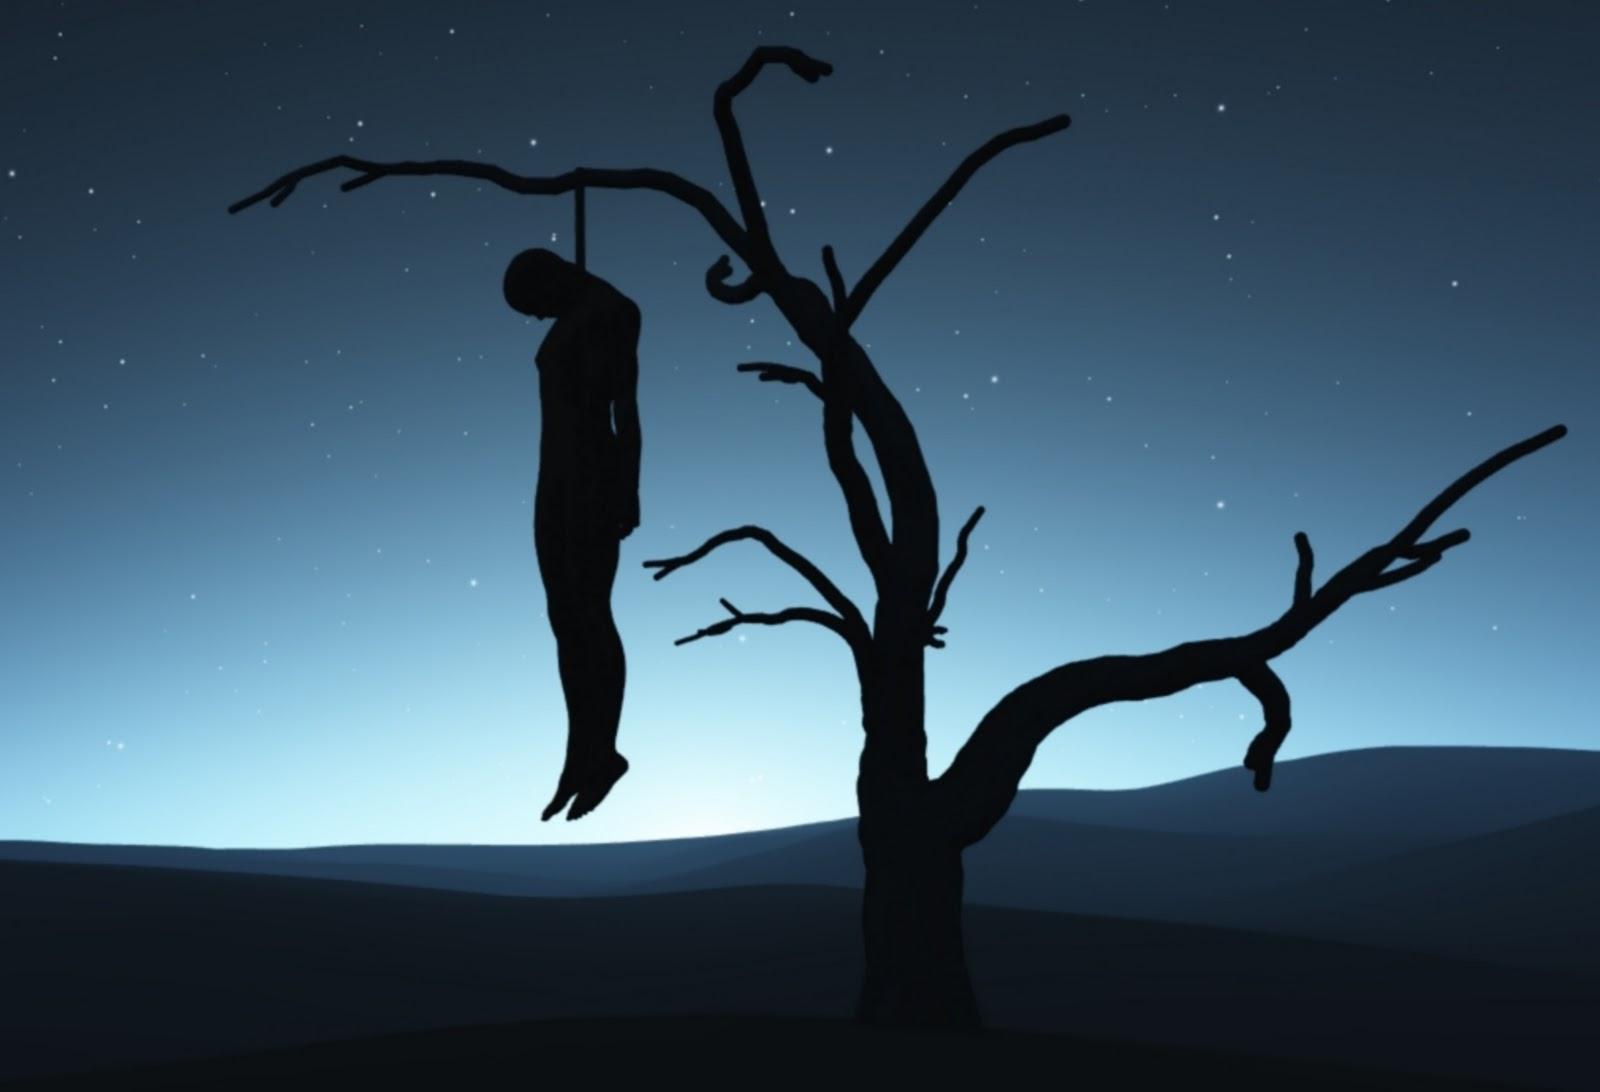 बिहे हुनुभन्दा आठ दिन अघि युवकद्वारा आत्महत्या